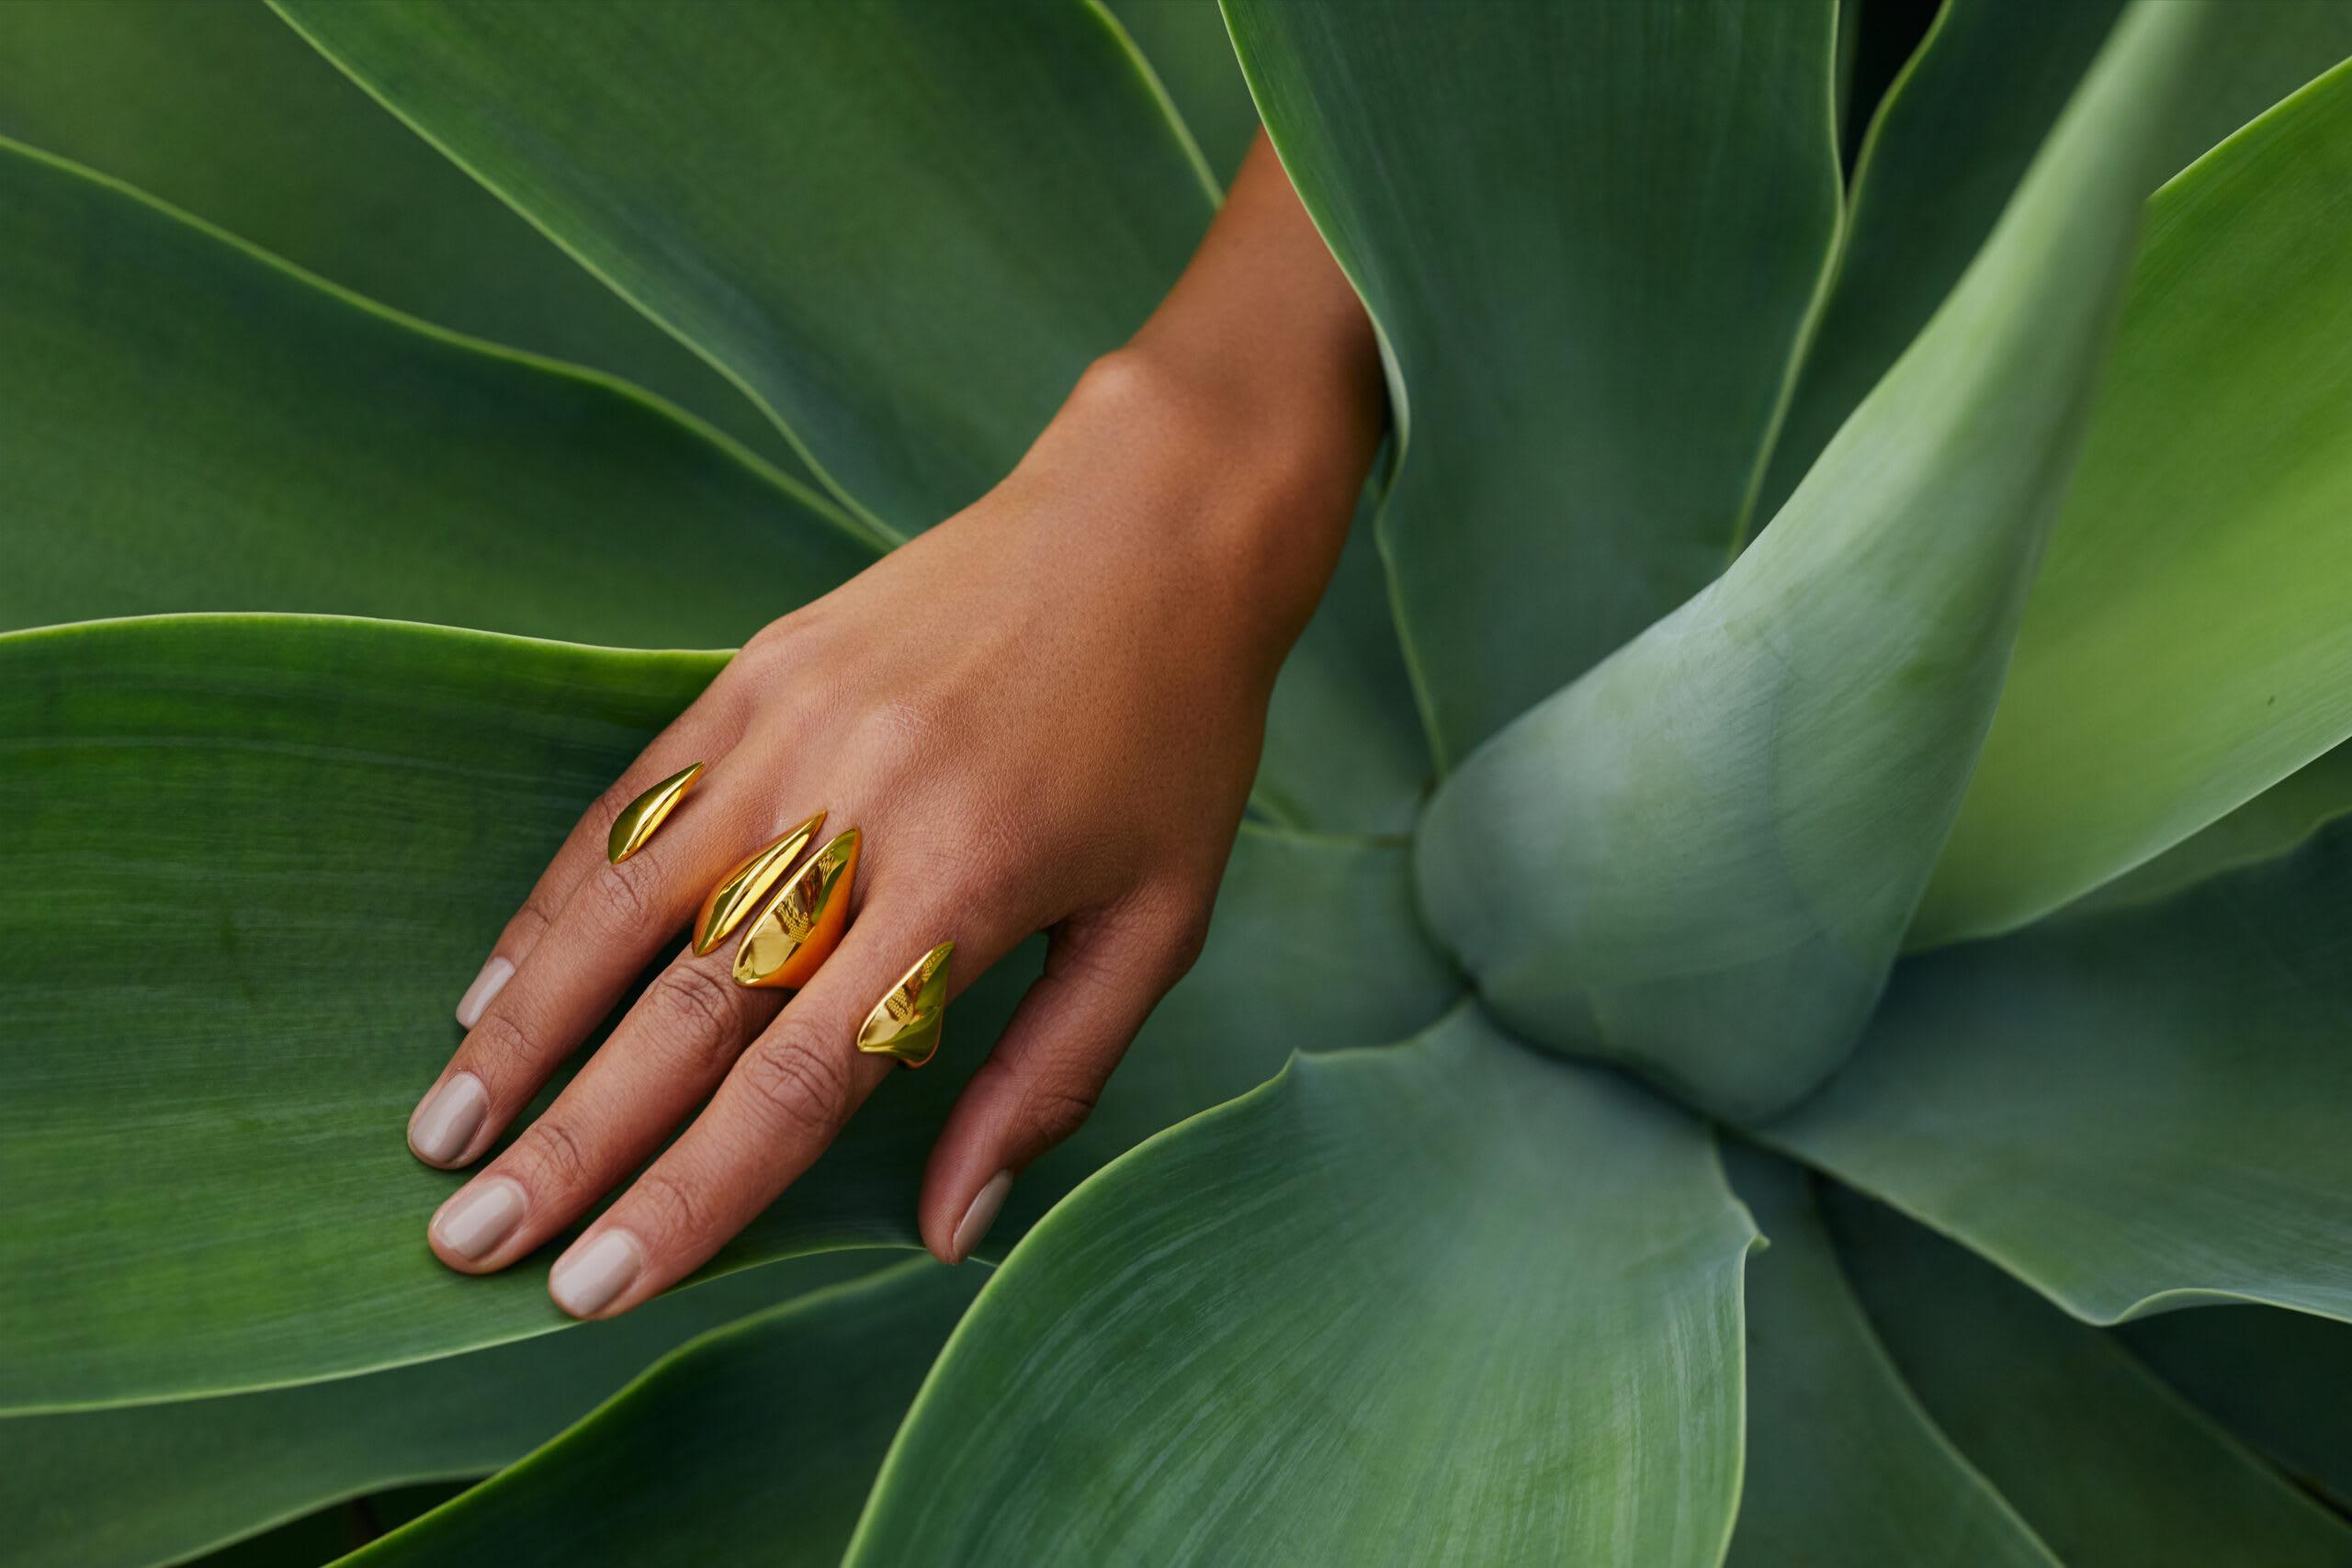 """Swarm Knuckle Ring by Soledad Lowe in nature"""